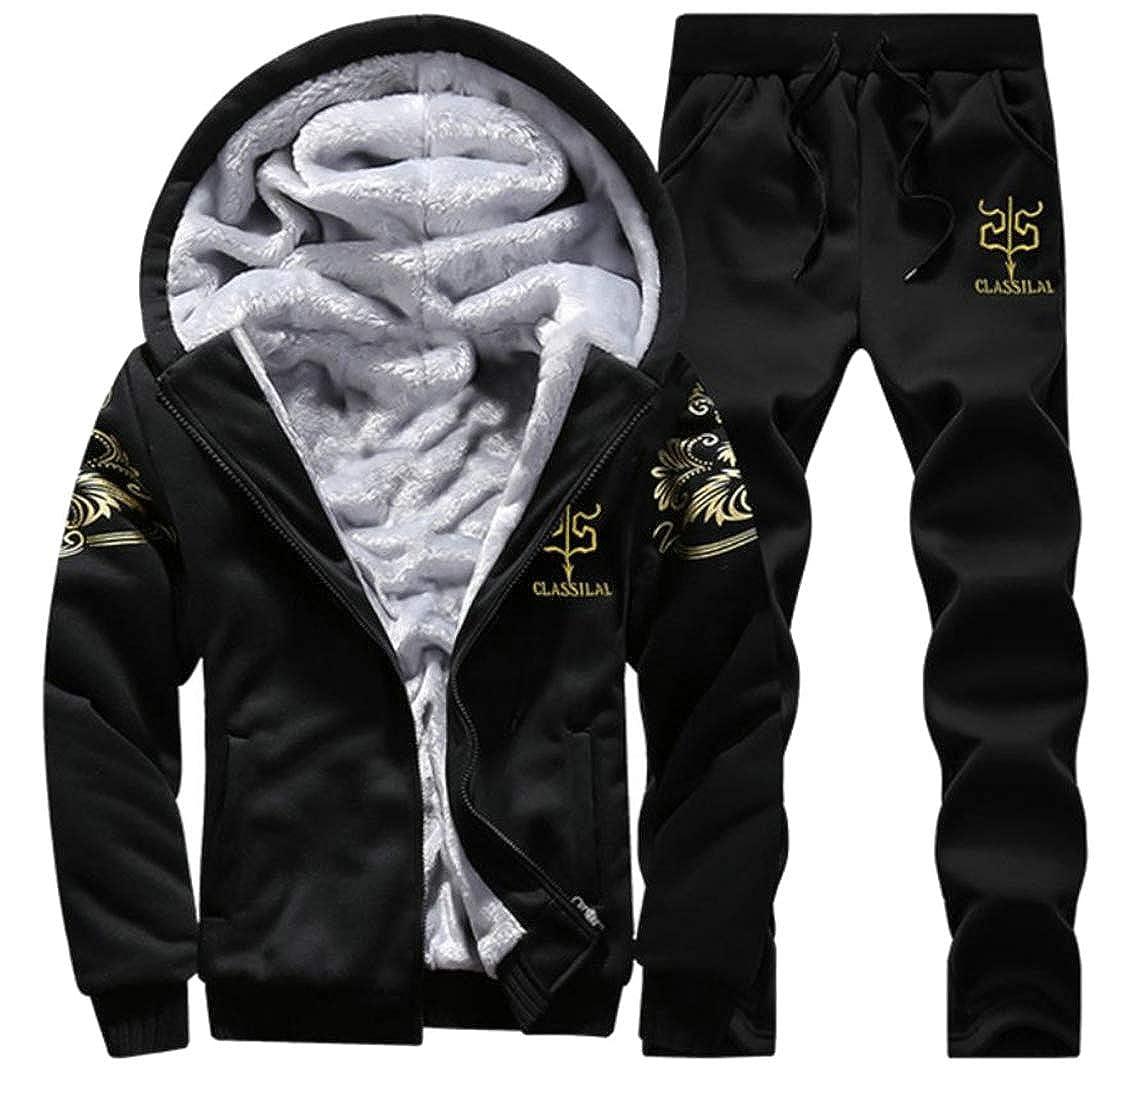 C/&H Mens Fleece 2 Pcs Activewear Hoodies Fall Winter Trousers Tracksuits